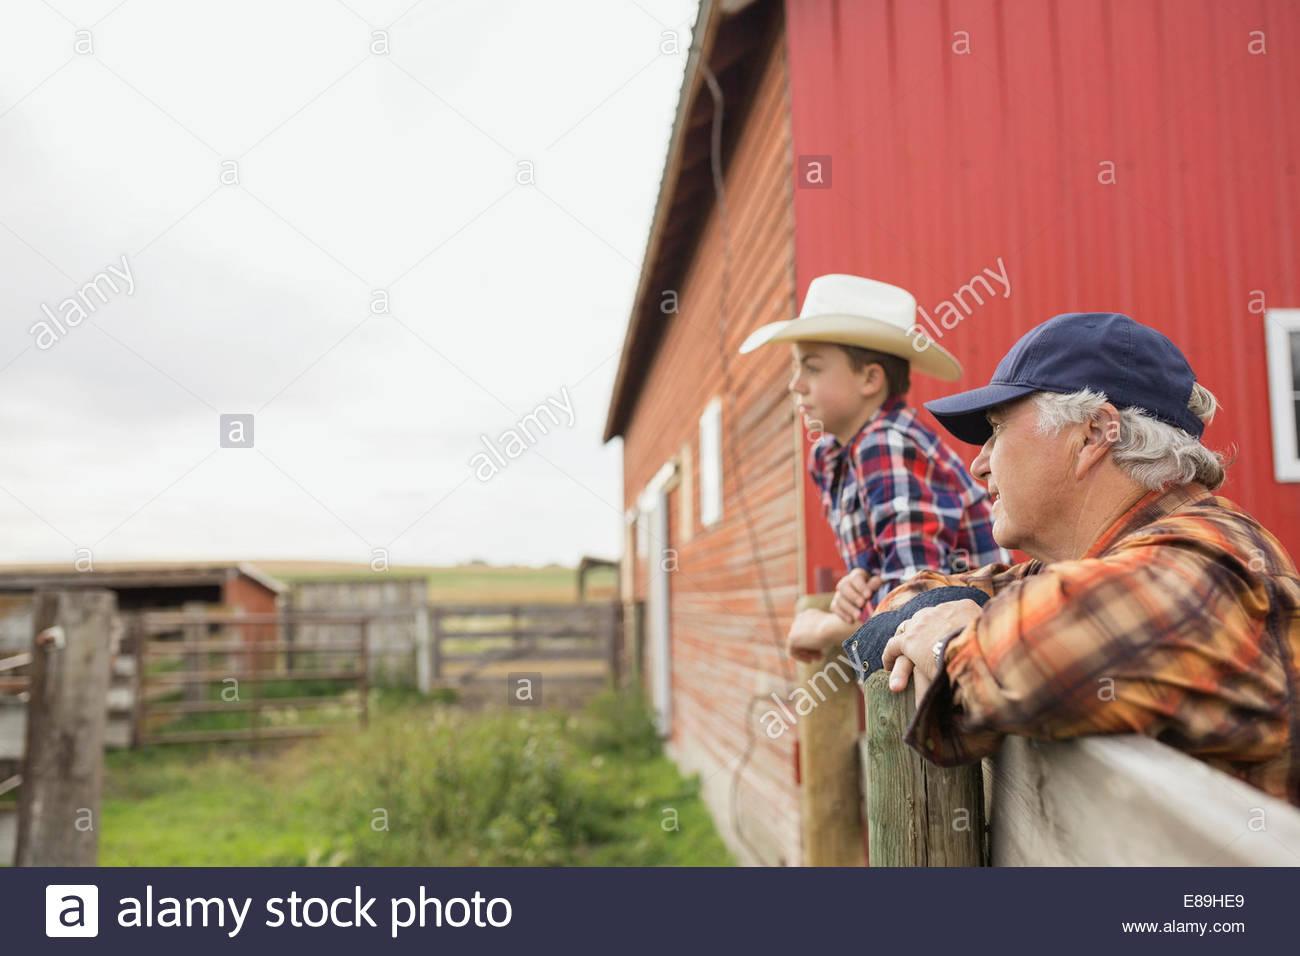 Grand-père et petit-fils leaning on fence on farm Photo Stock